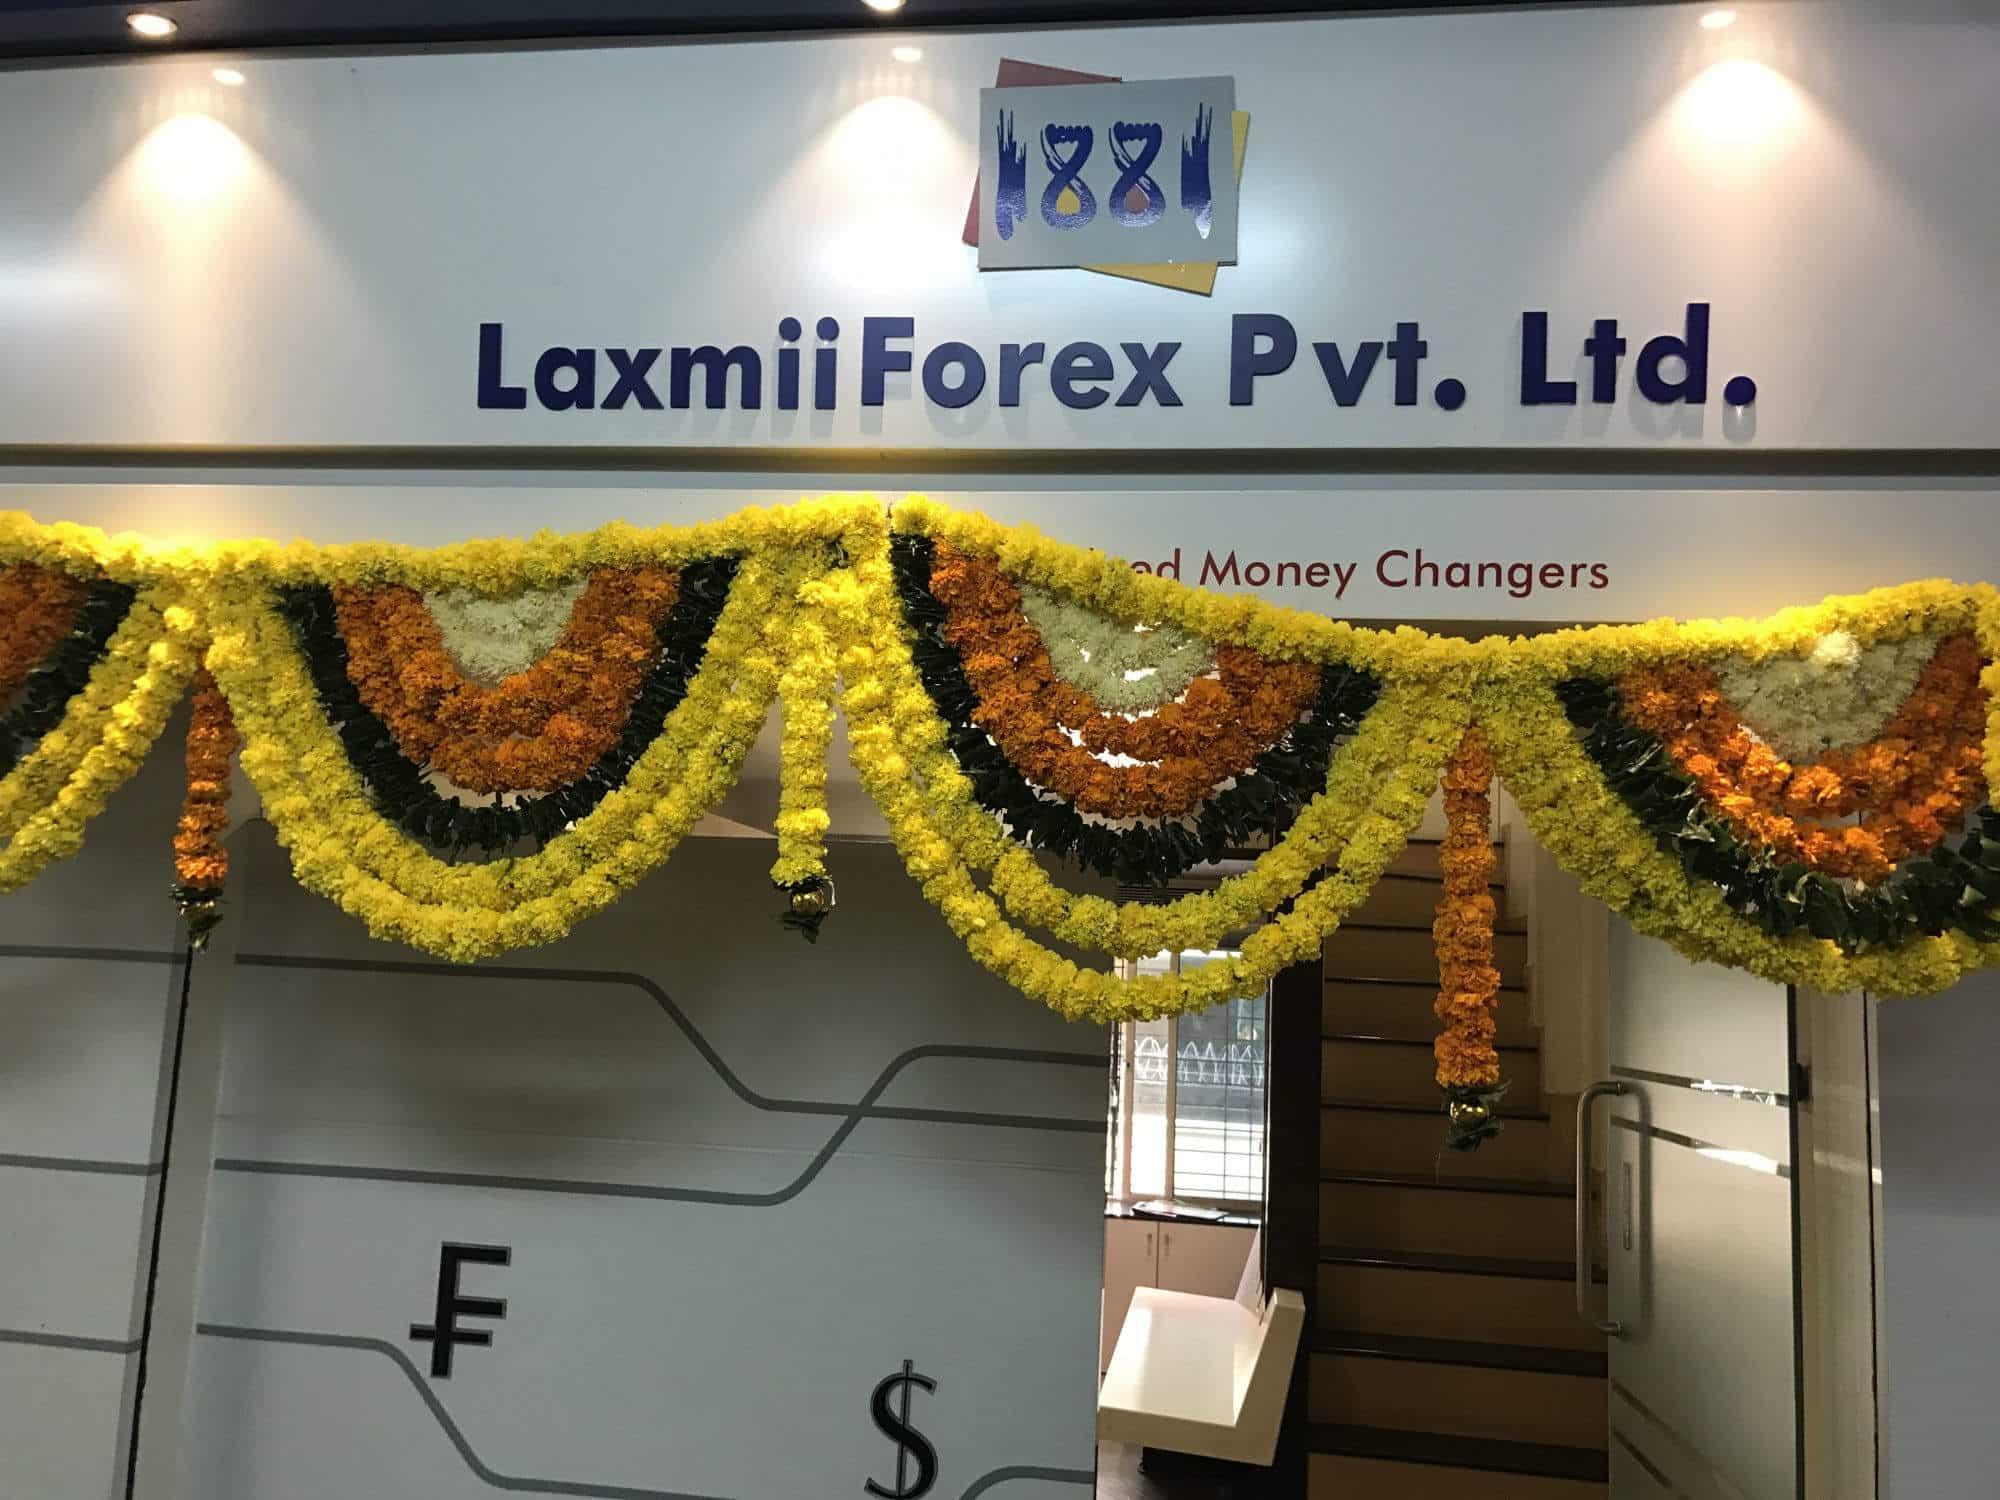 Laxmi forex law college road trip forex growth bot не торгует